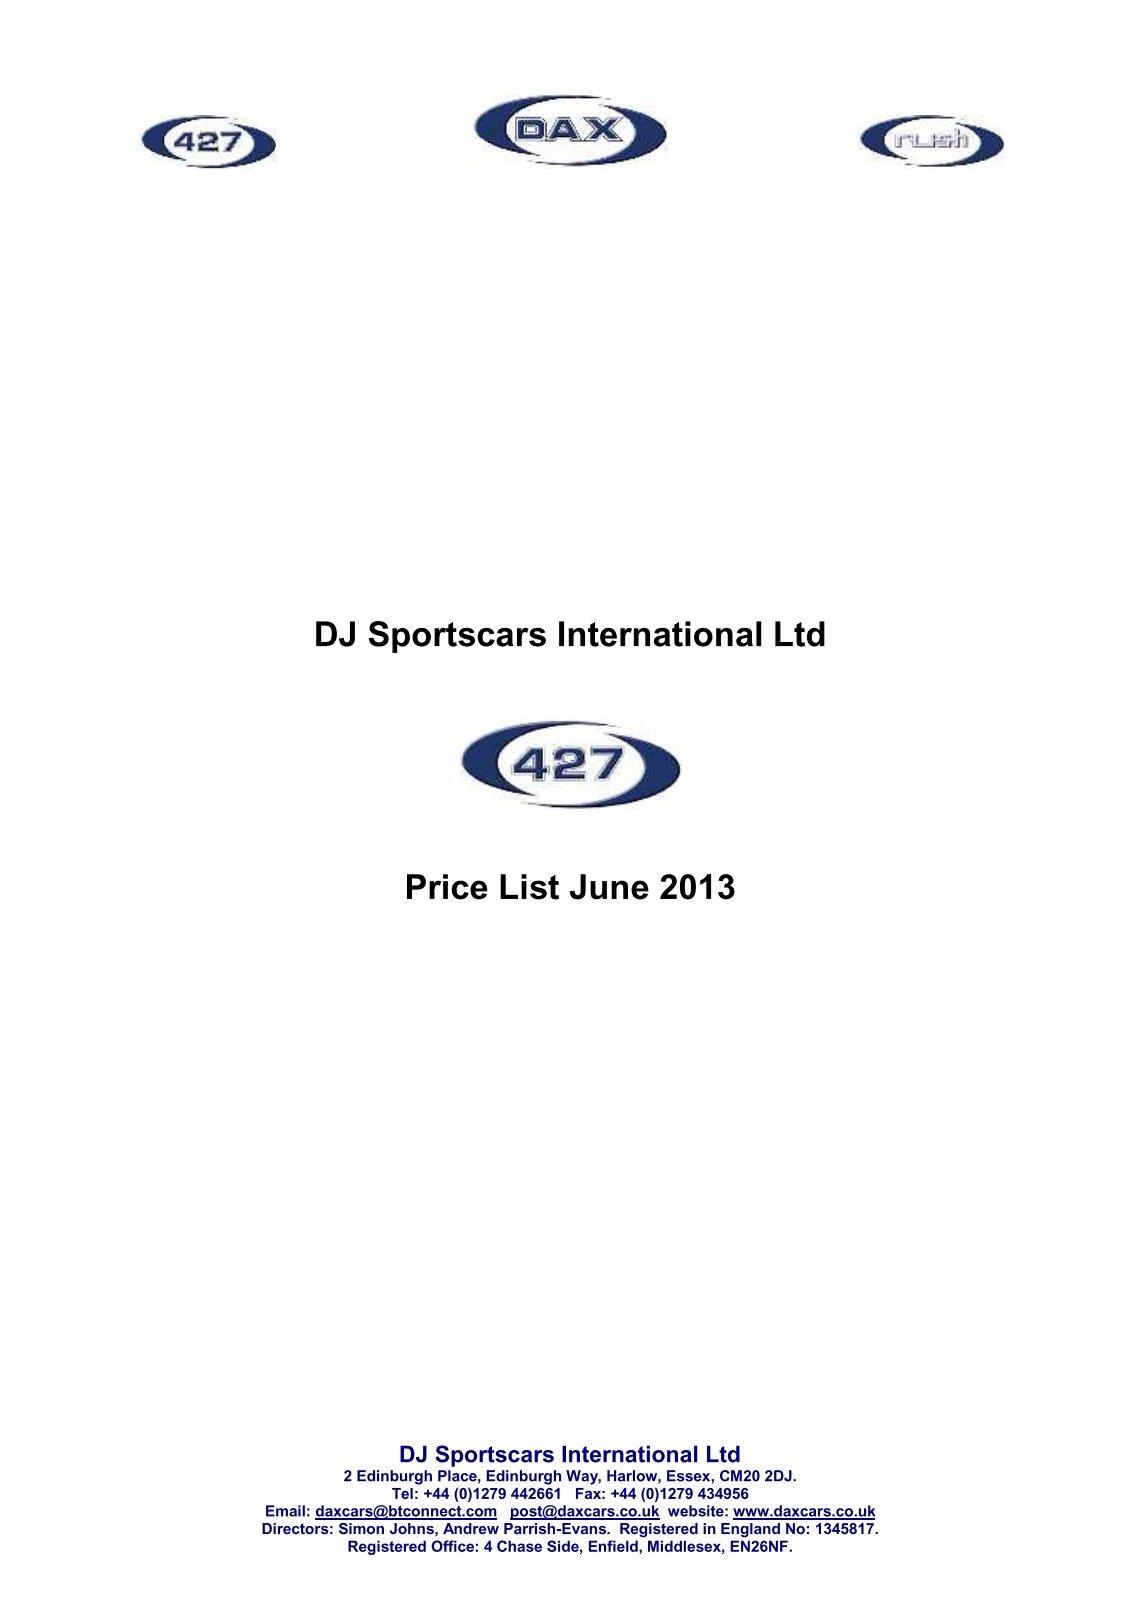 Free Magazines From DAXRUSHCOUK - Sports cars international